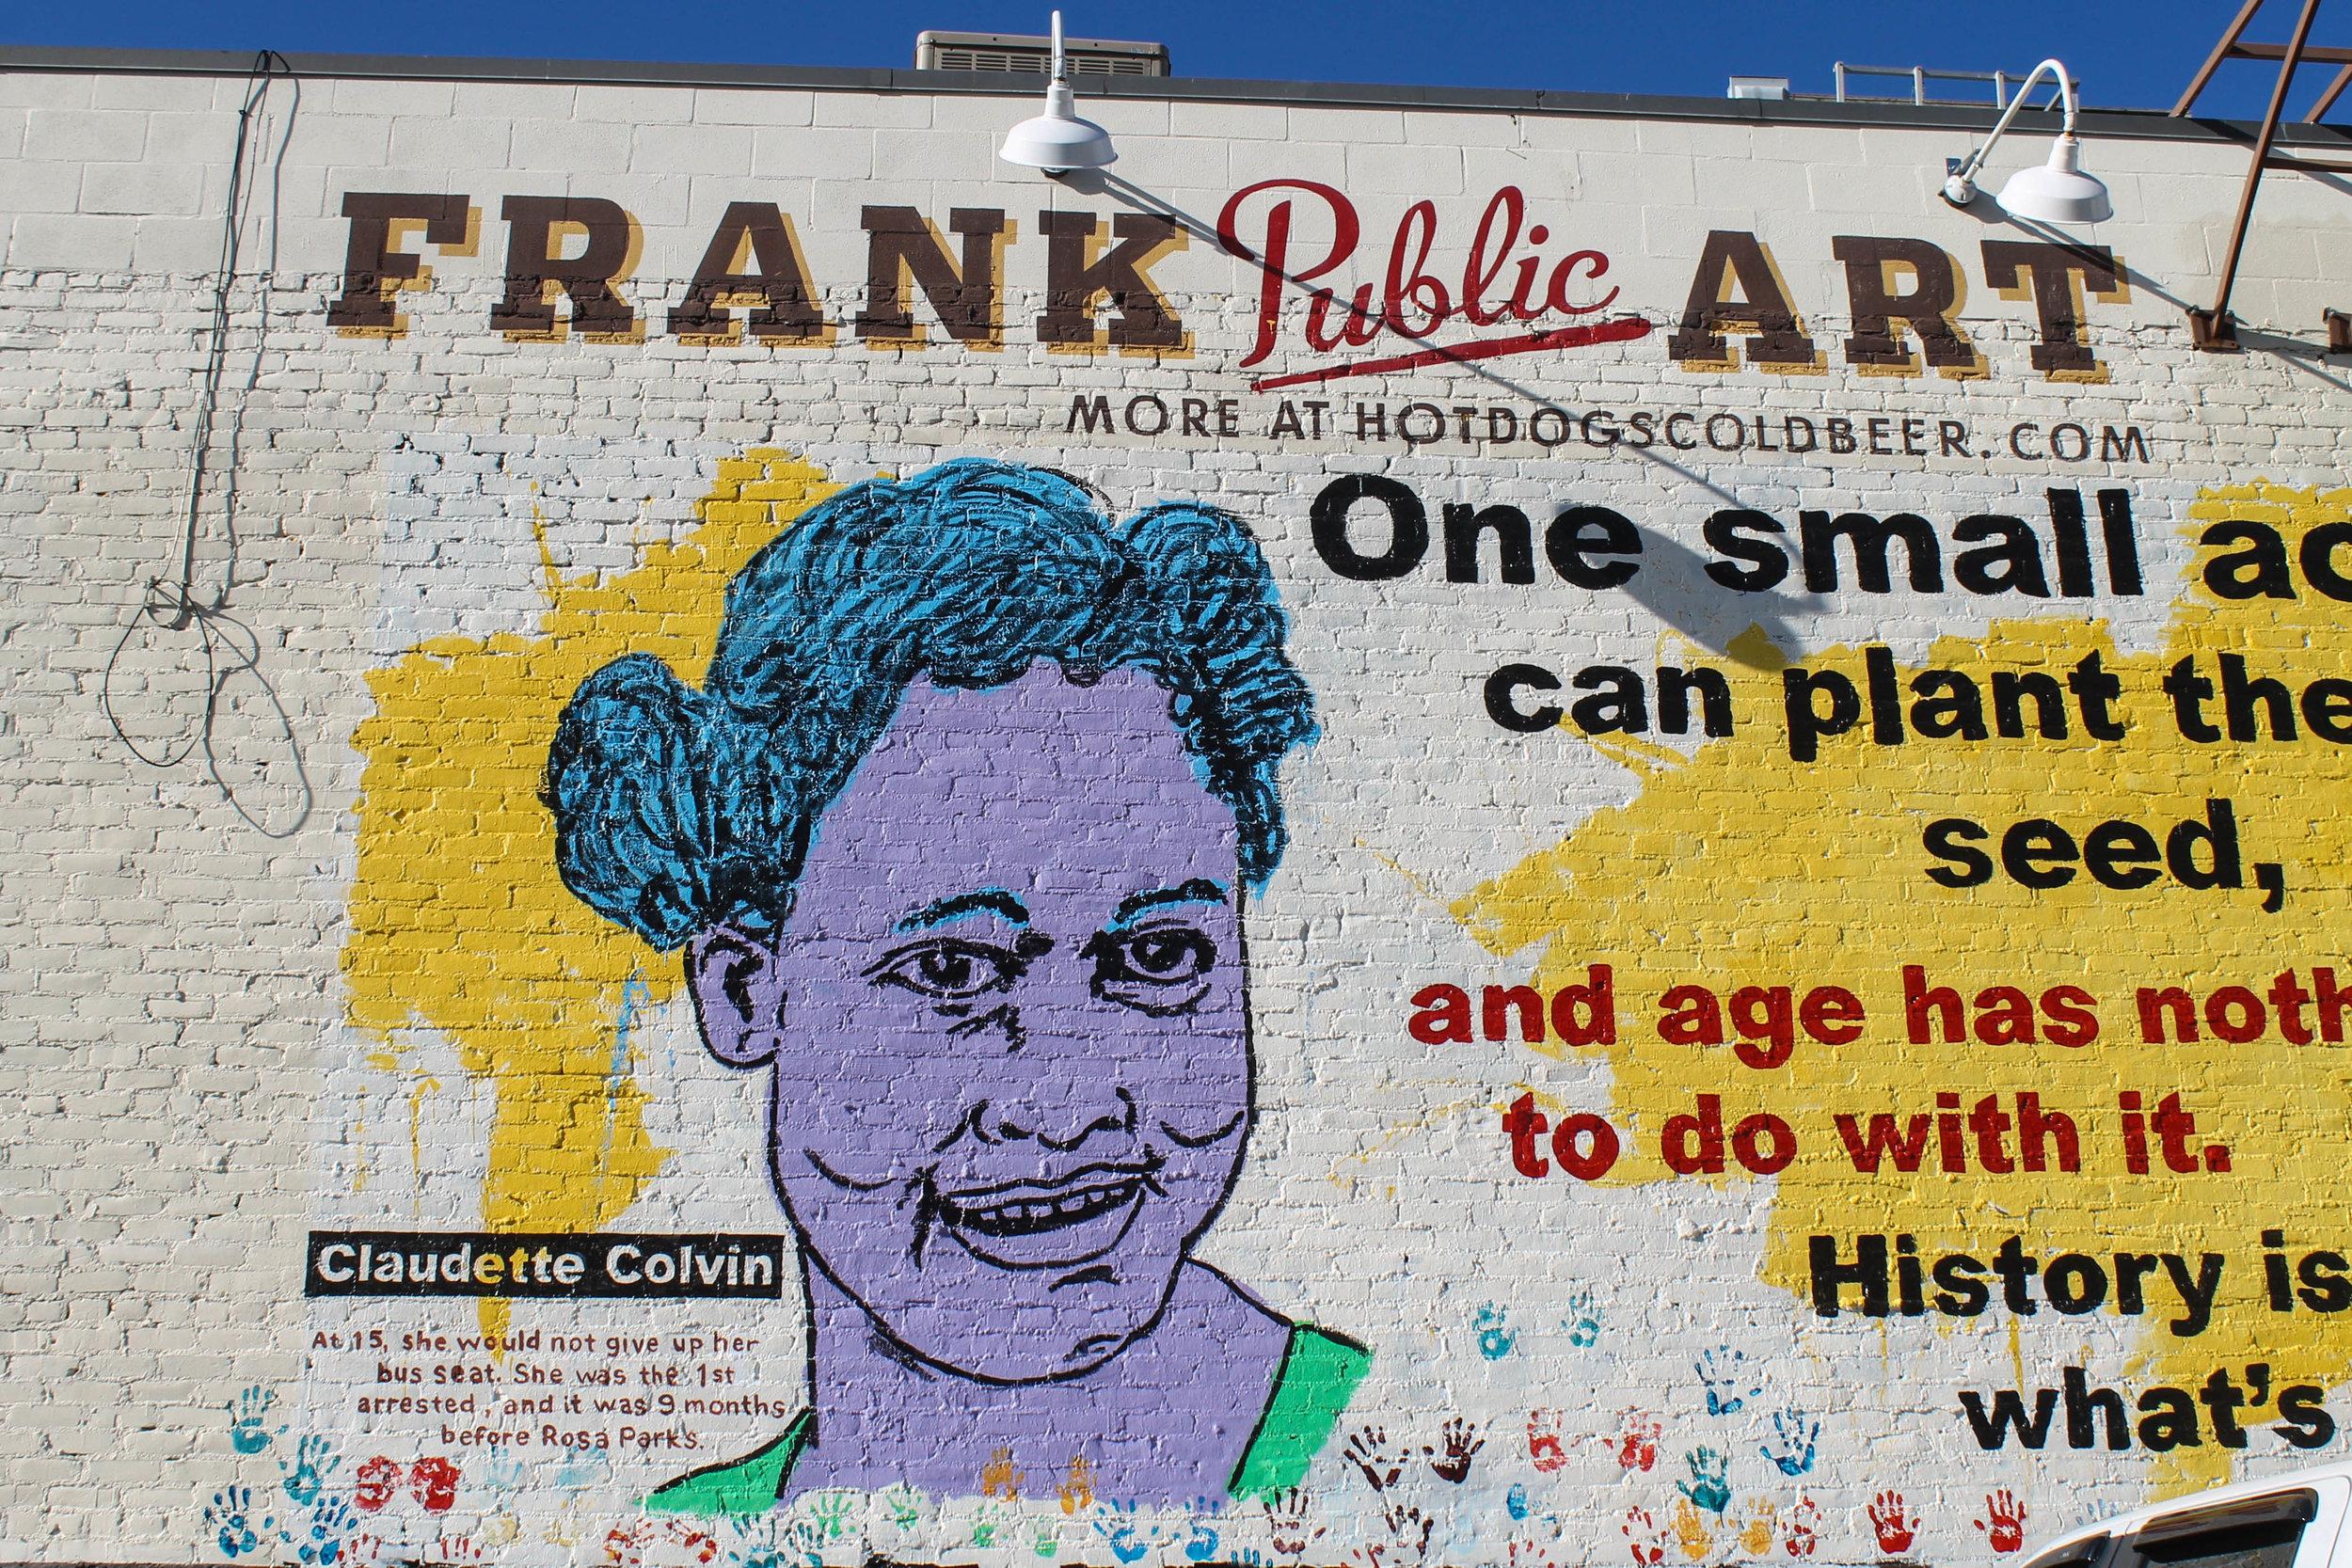 frank-public-art